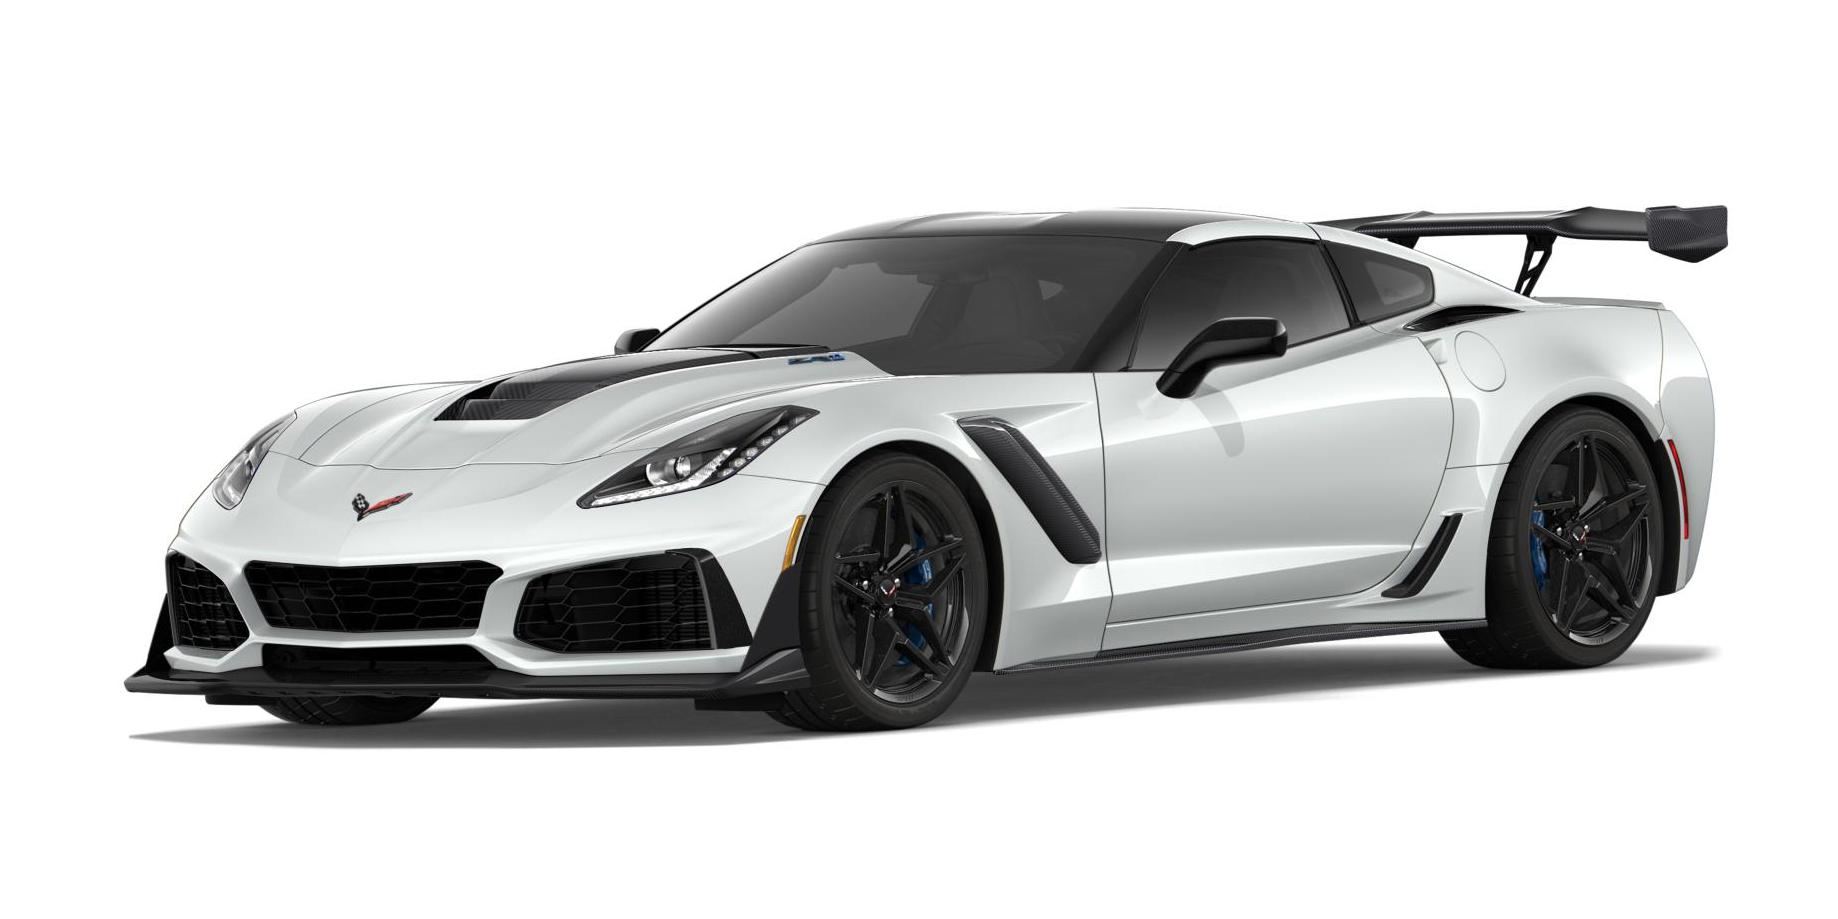 2020 Chevrolet Corvette Coupe ZR1 3ZR | Chevrolet Engine News